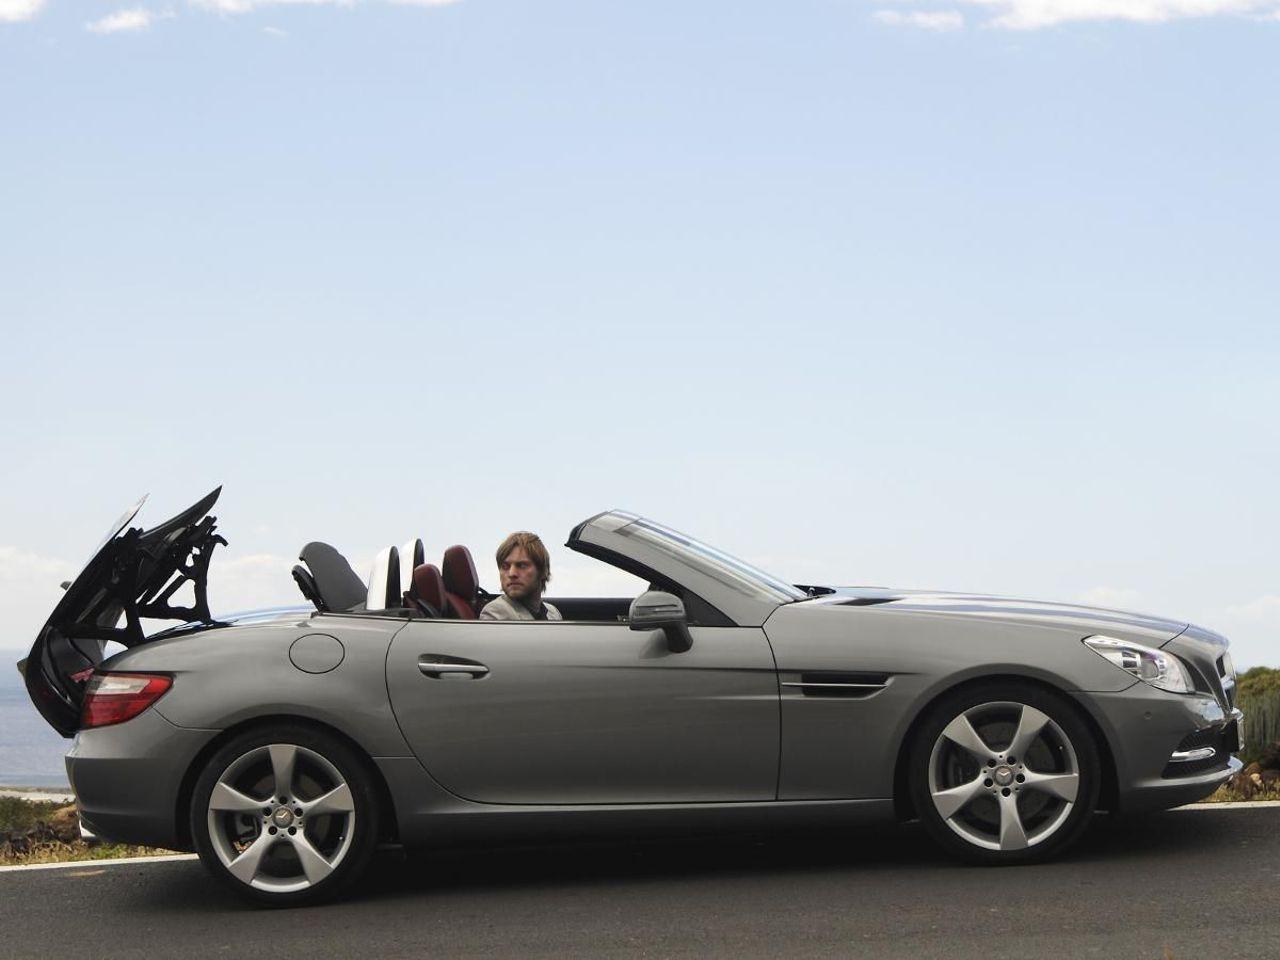 Mercedes SLK-Class Roadster convertible